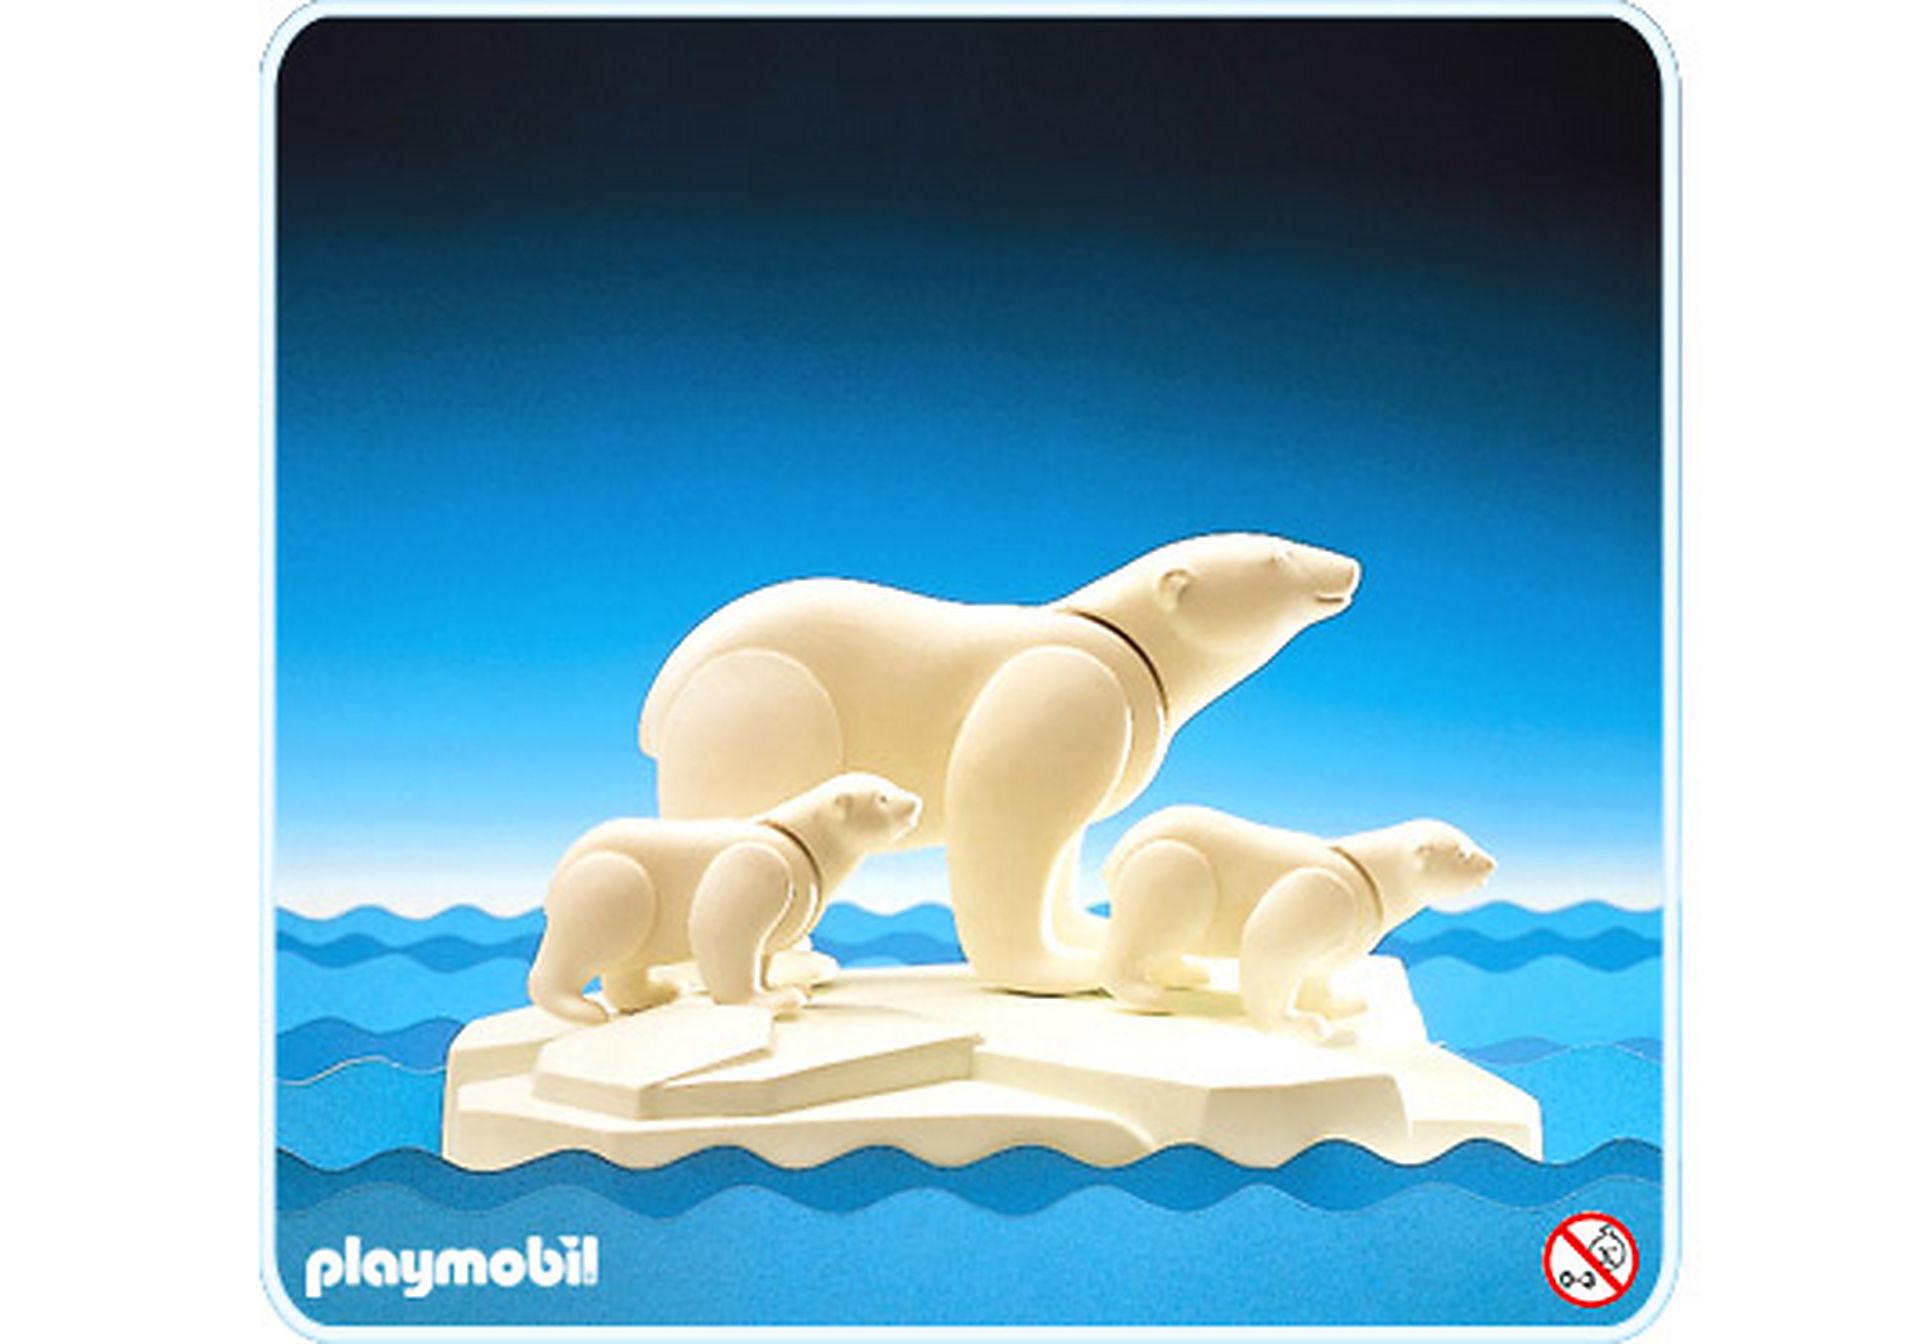 http://media.playmobil.com/i/playmobil/3248-A_product_detail/Eisbären/Eisscholle